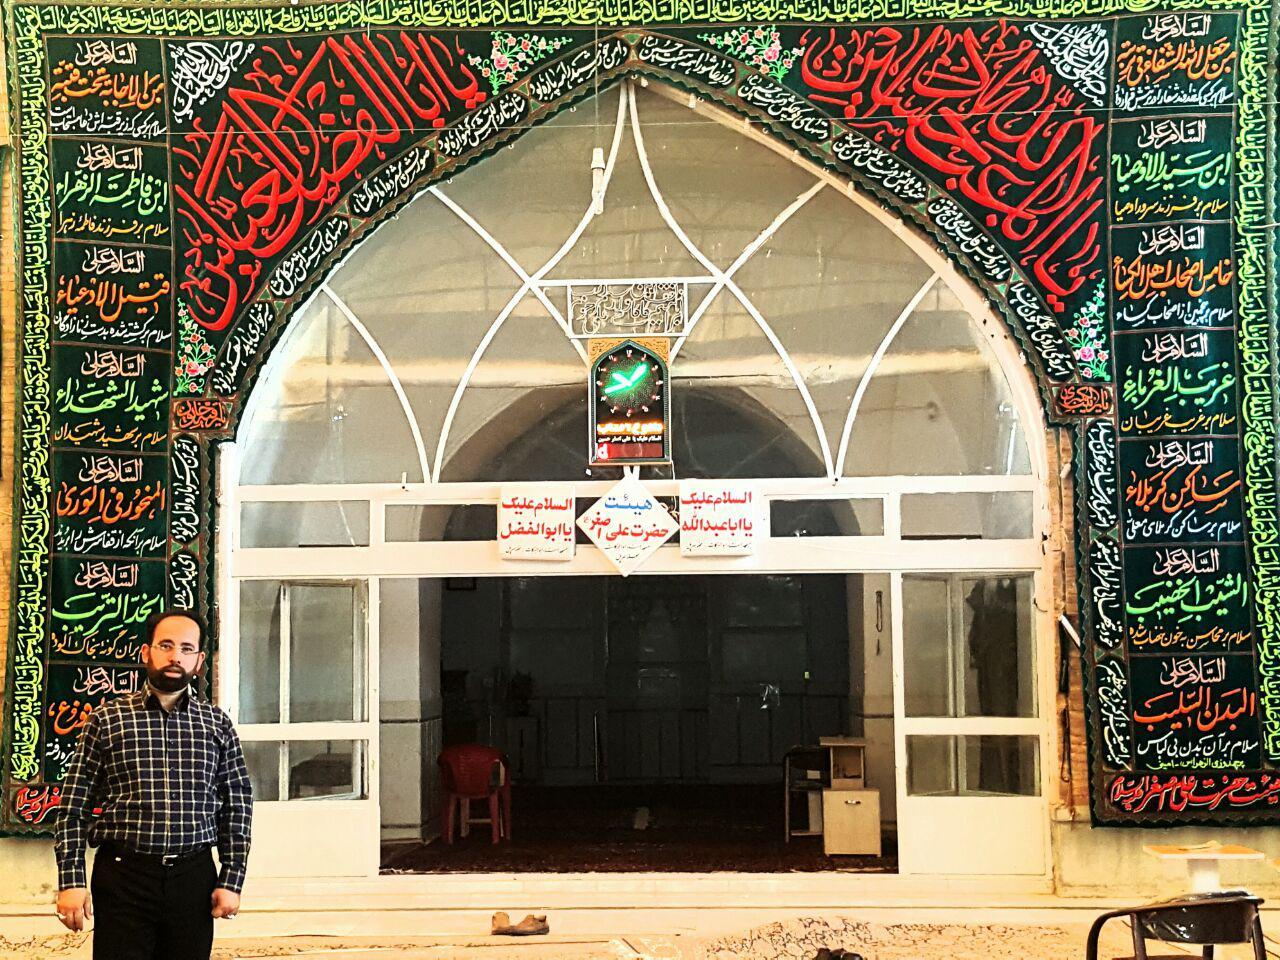 photo 2016 09 03 09 13 02 %پرچم دوزی الزهرا اصفهان